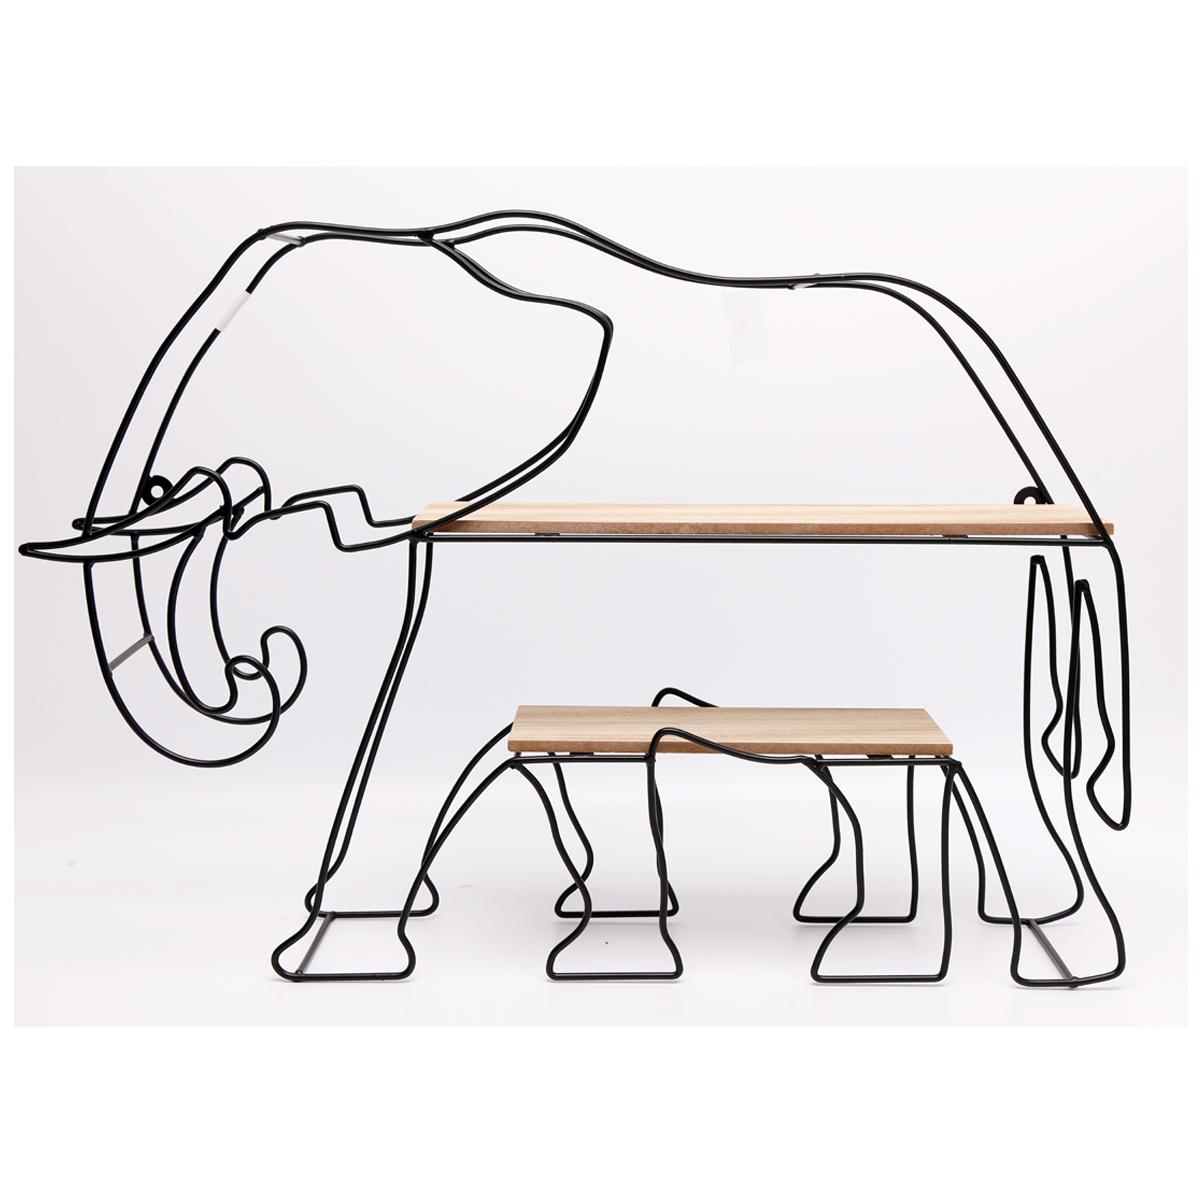 Étagère design métal bois \'Elephant\' - 54x38x10 cm - [A0022]